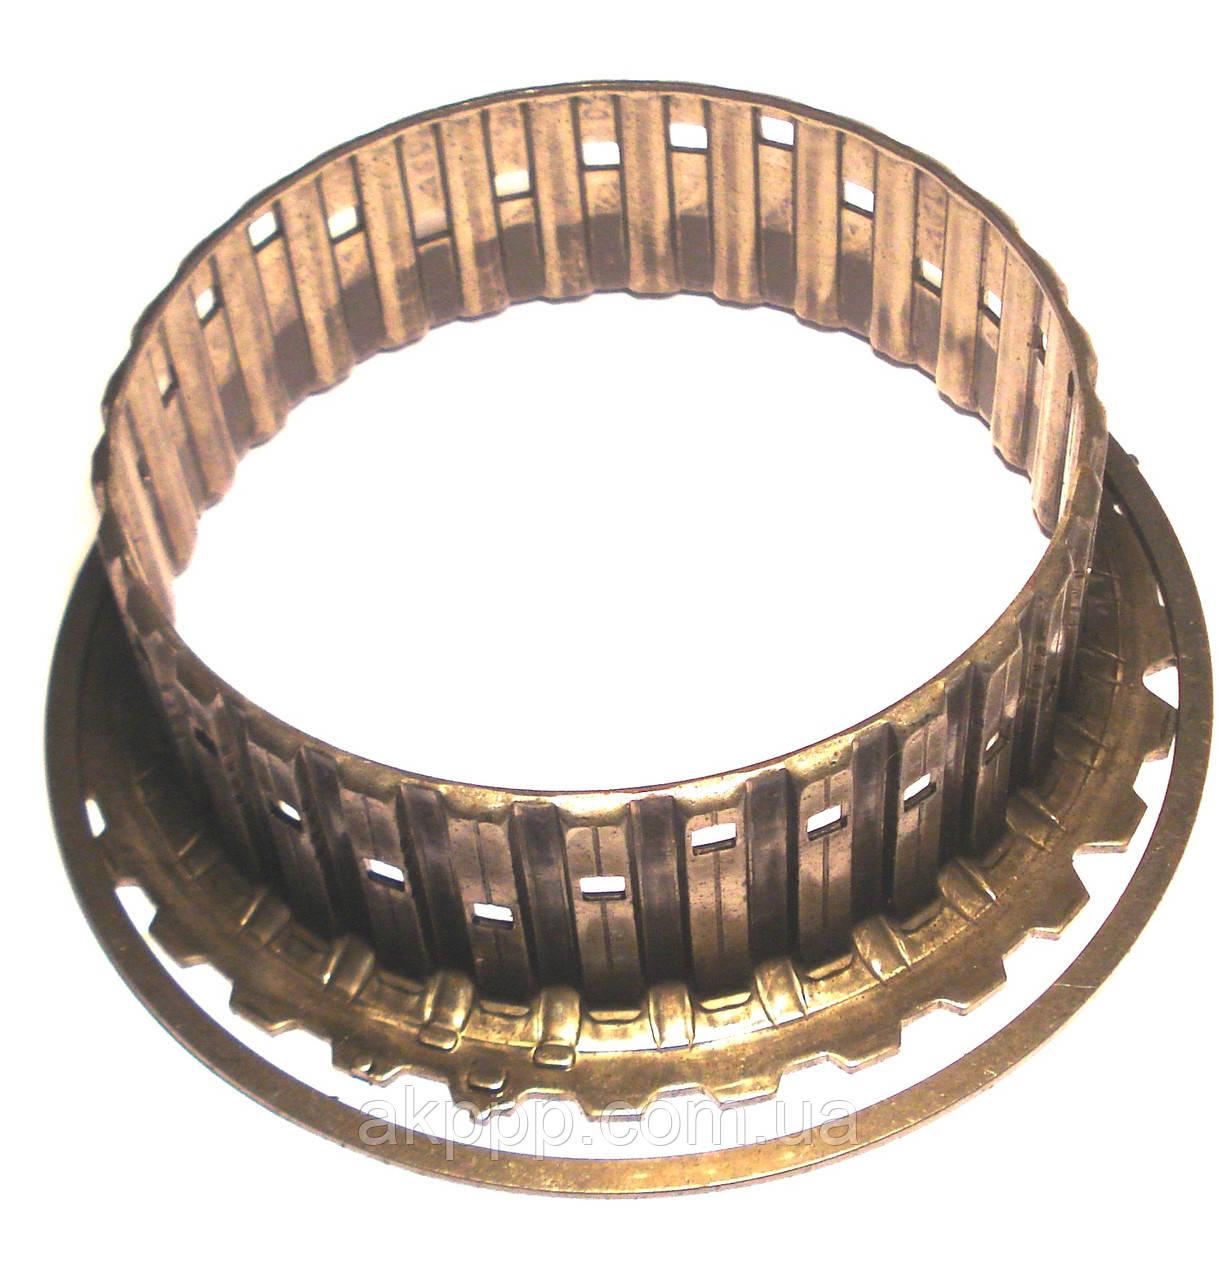 Акпп ZF6HP26, ZF6HP28, Ступица прямой передачи со стопорным кольцом AL3Z7F236A б/у